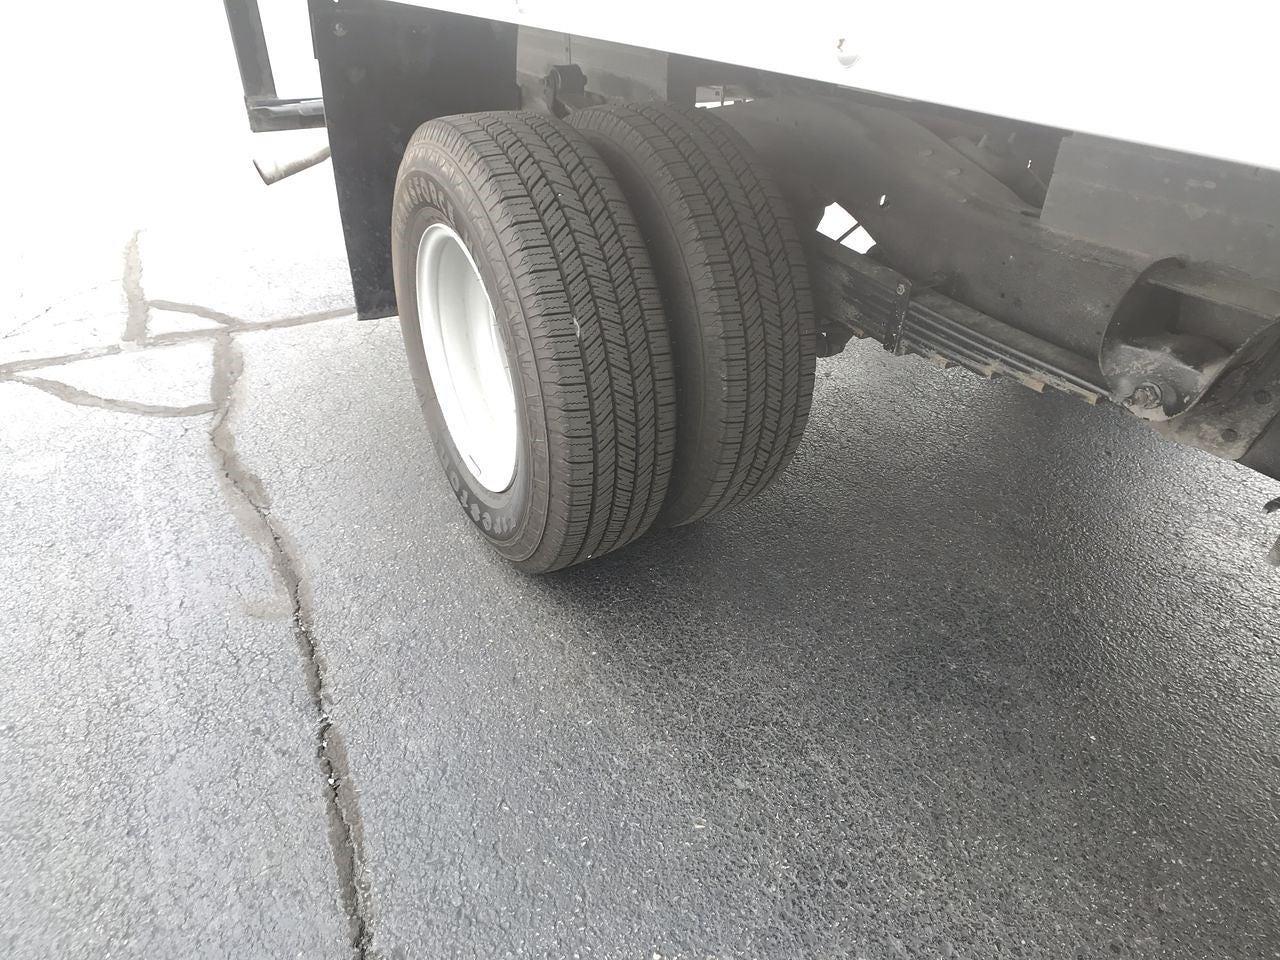 2019 Express 3500 DRW 4x2,  Cutaway Van #112034 - photo 10